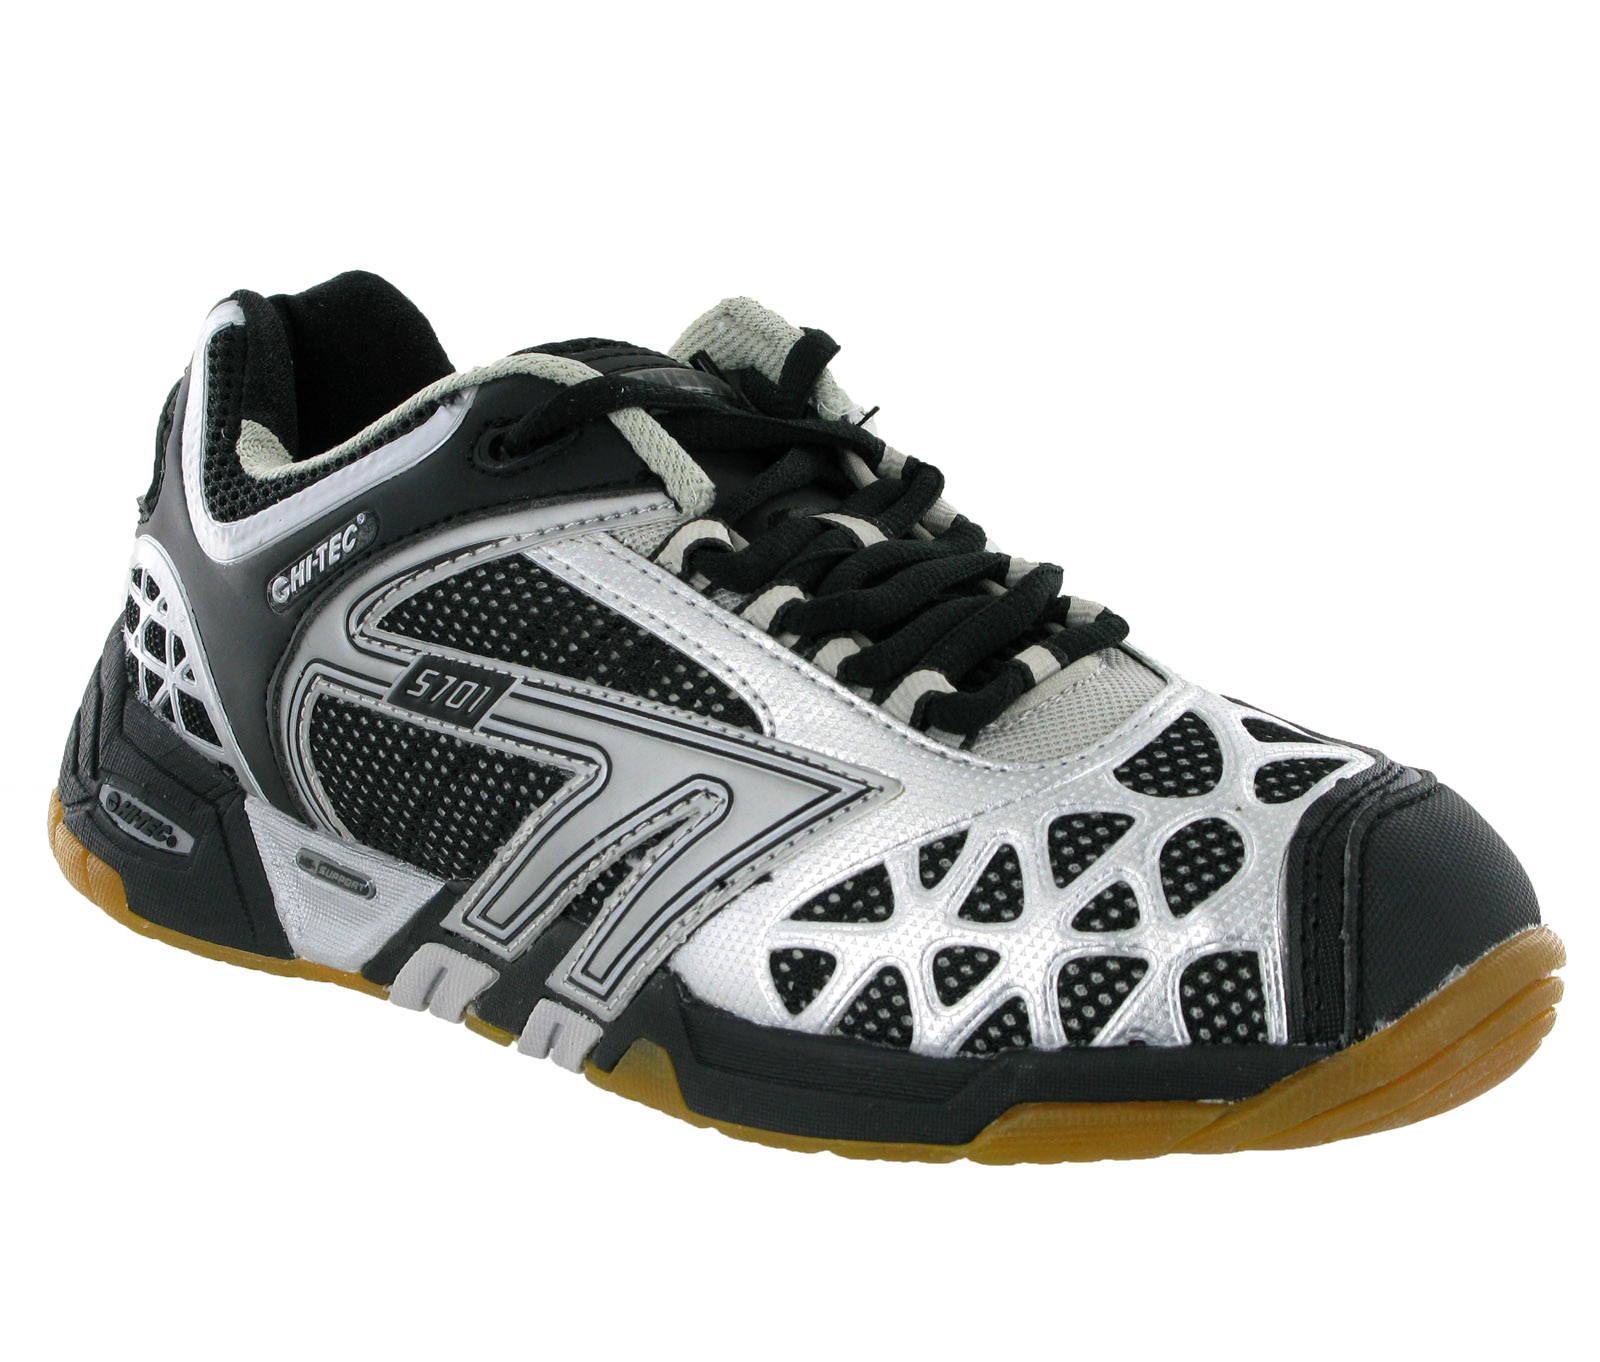 new-asics-gel-domain-3-women-s-court-shoes-white-diva-blue-9.png